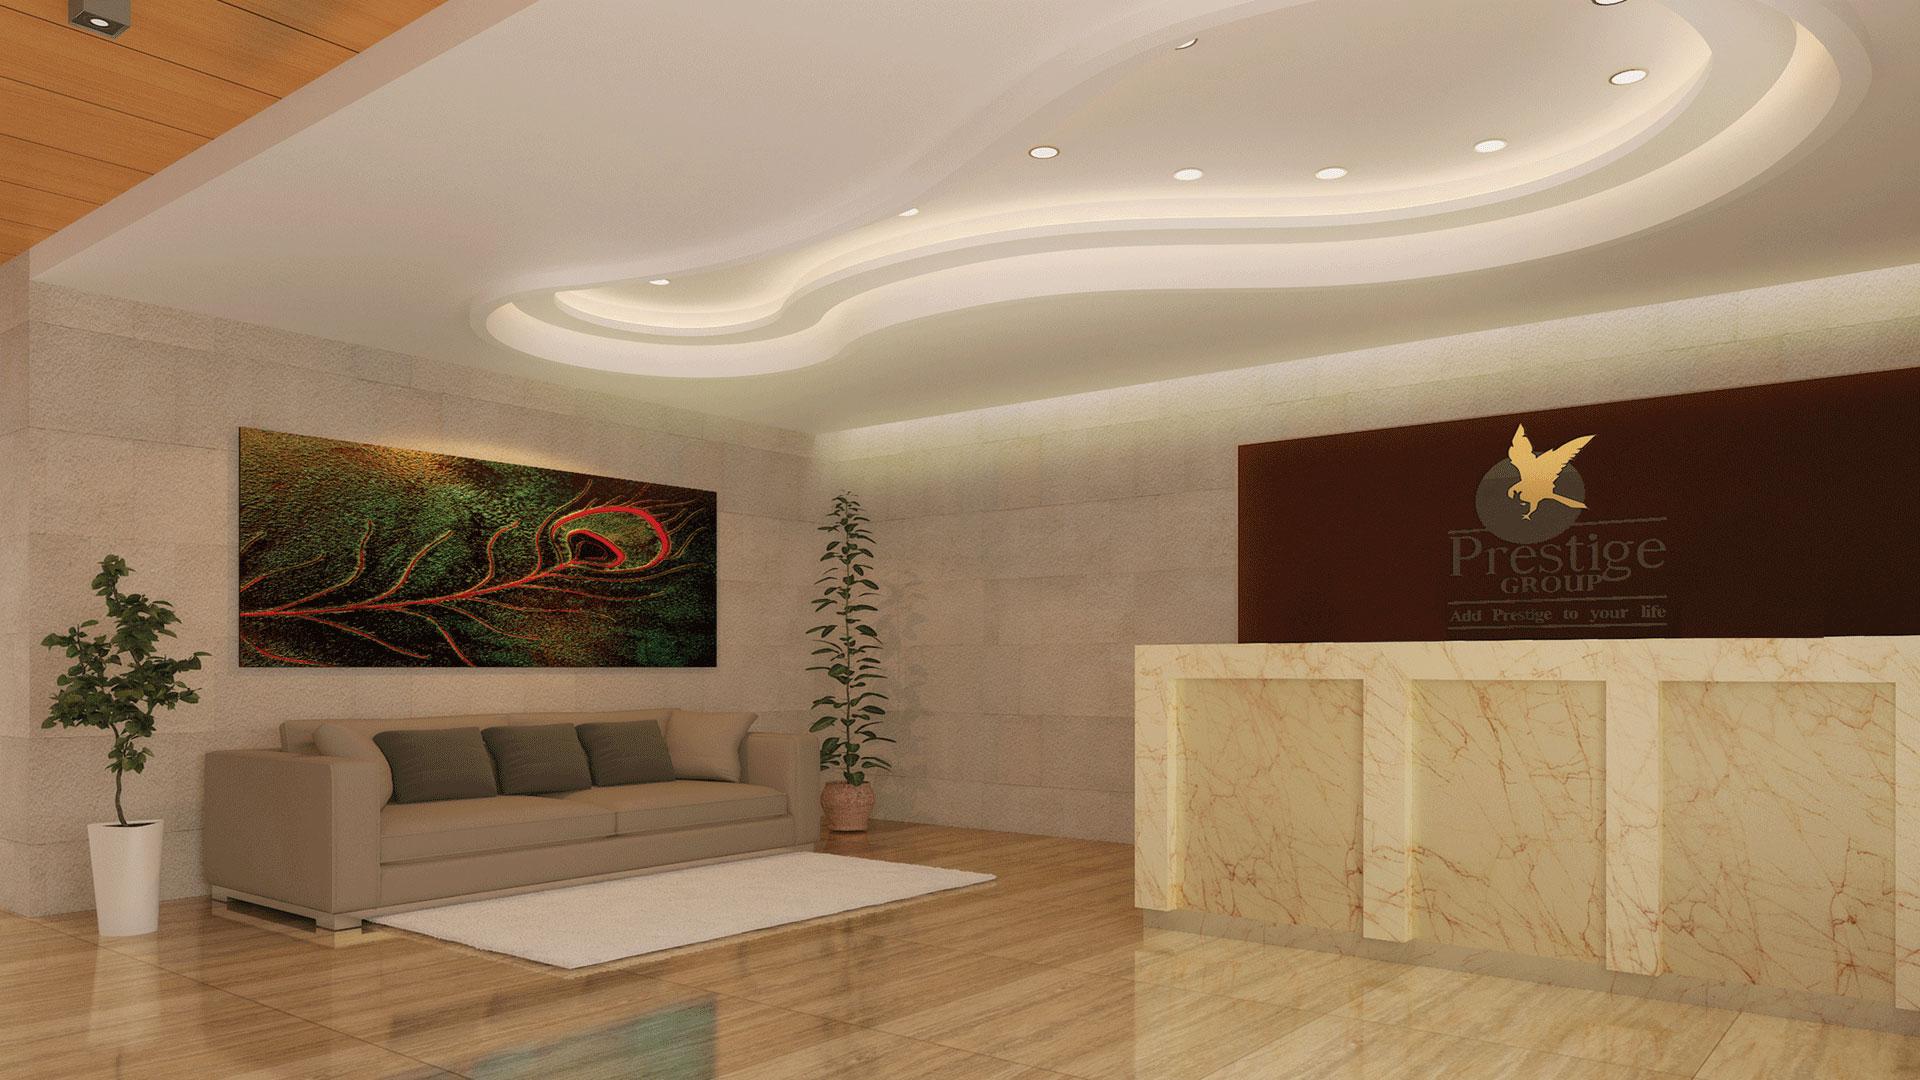 prestige-dolce-vita-Whitefield-Bangalore-Image-04